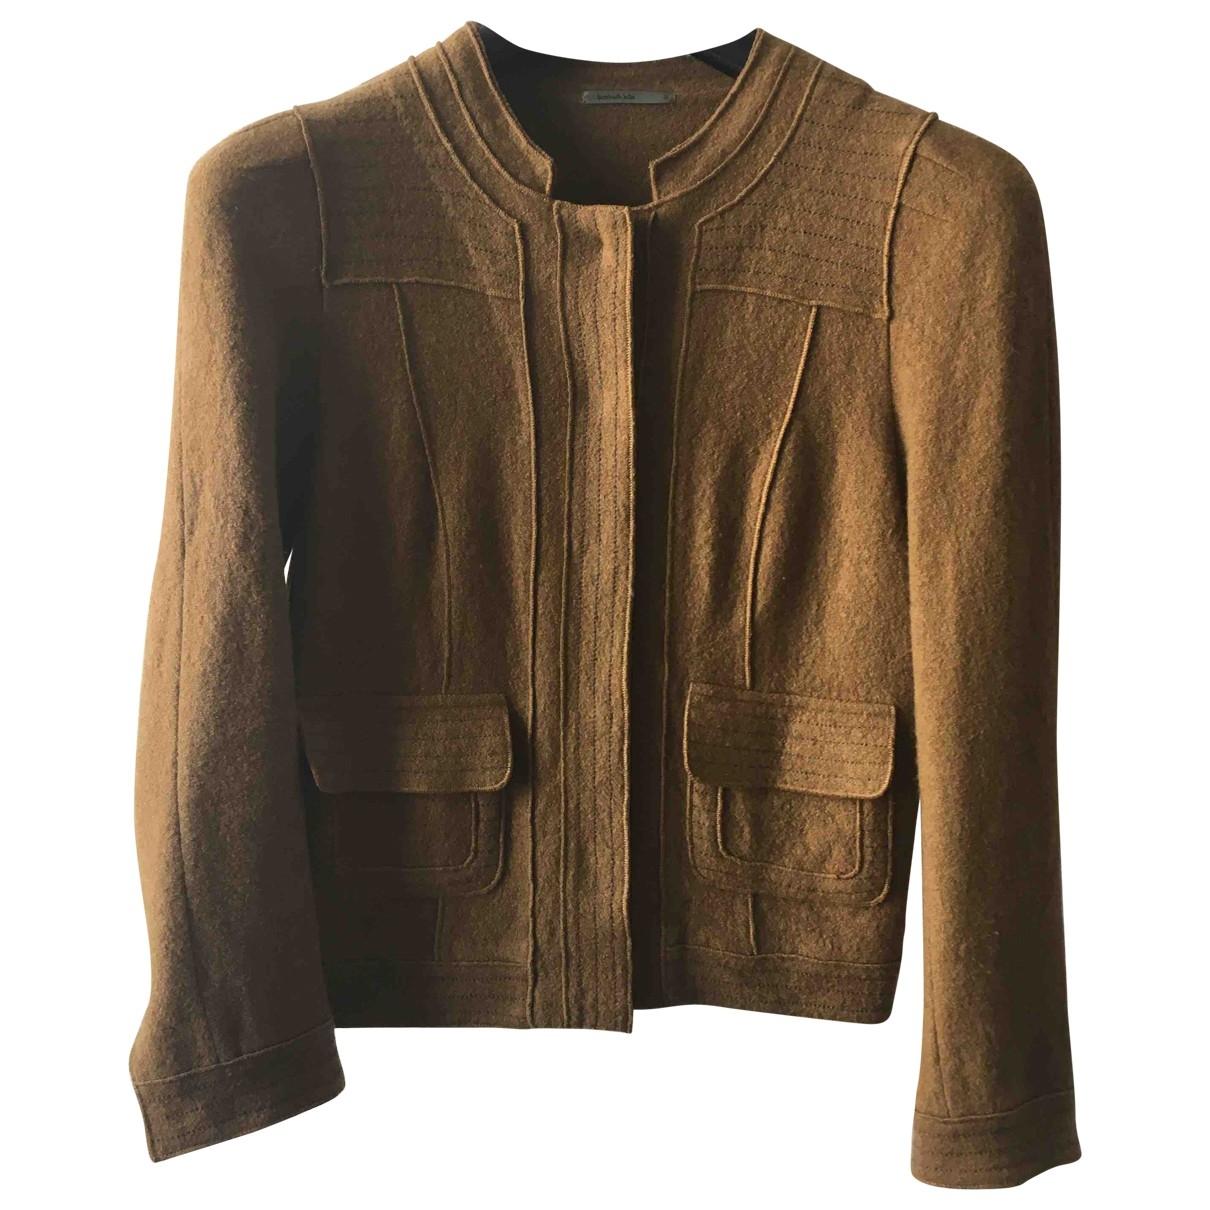 Bimba Y Lola \N Khaki Wool jacket for Women S International